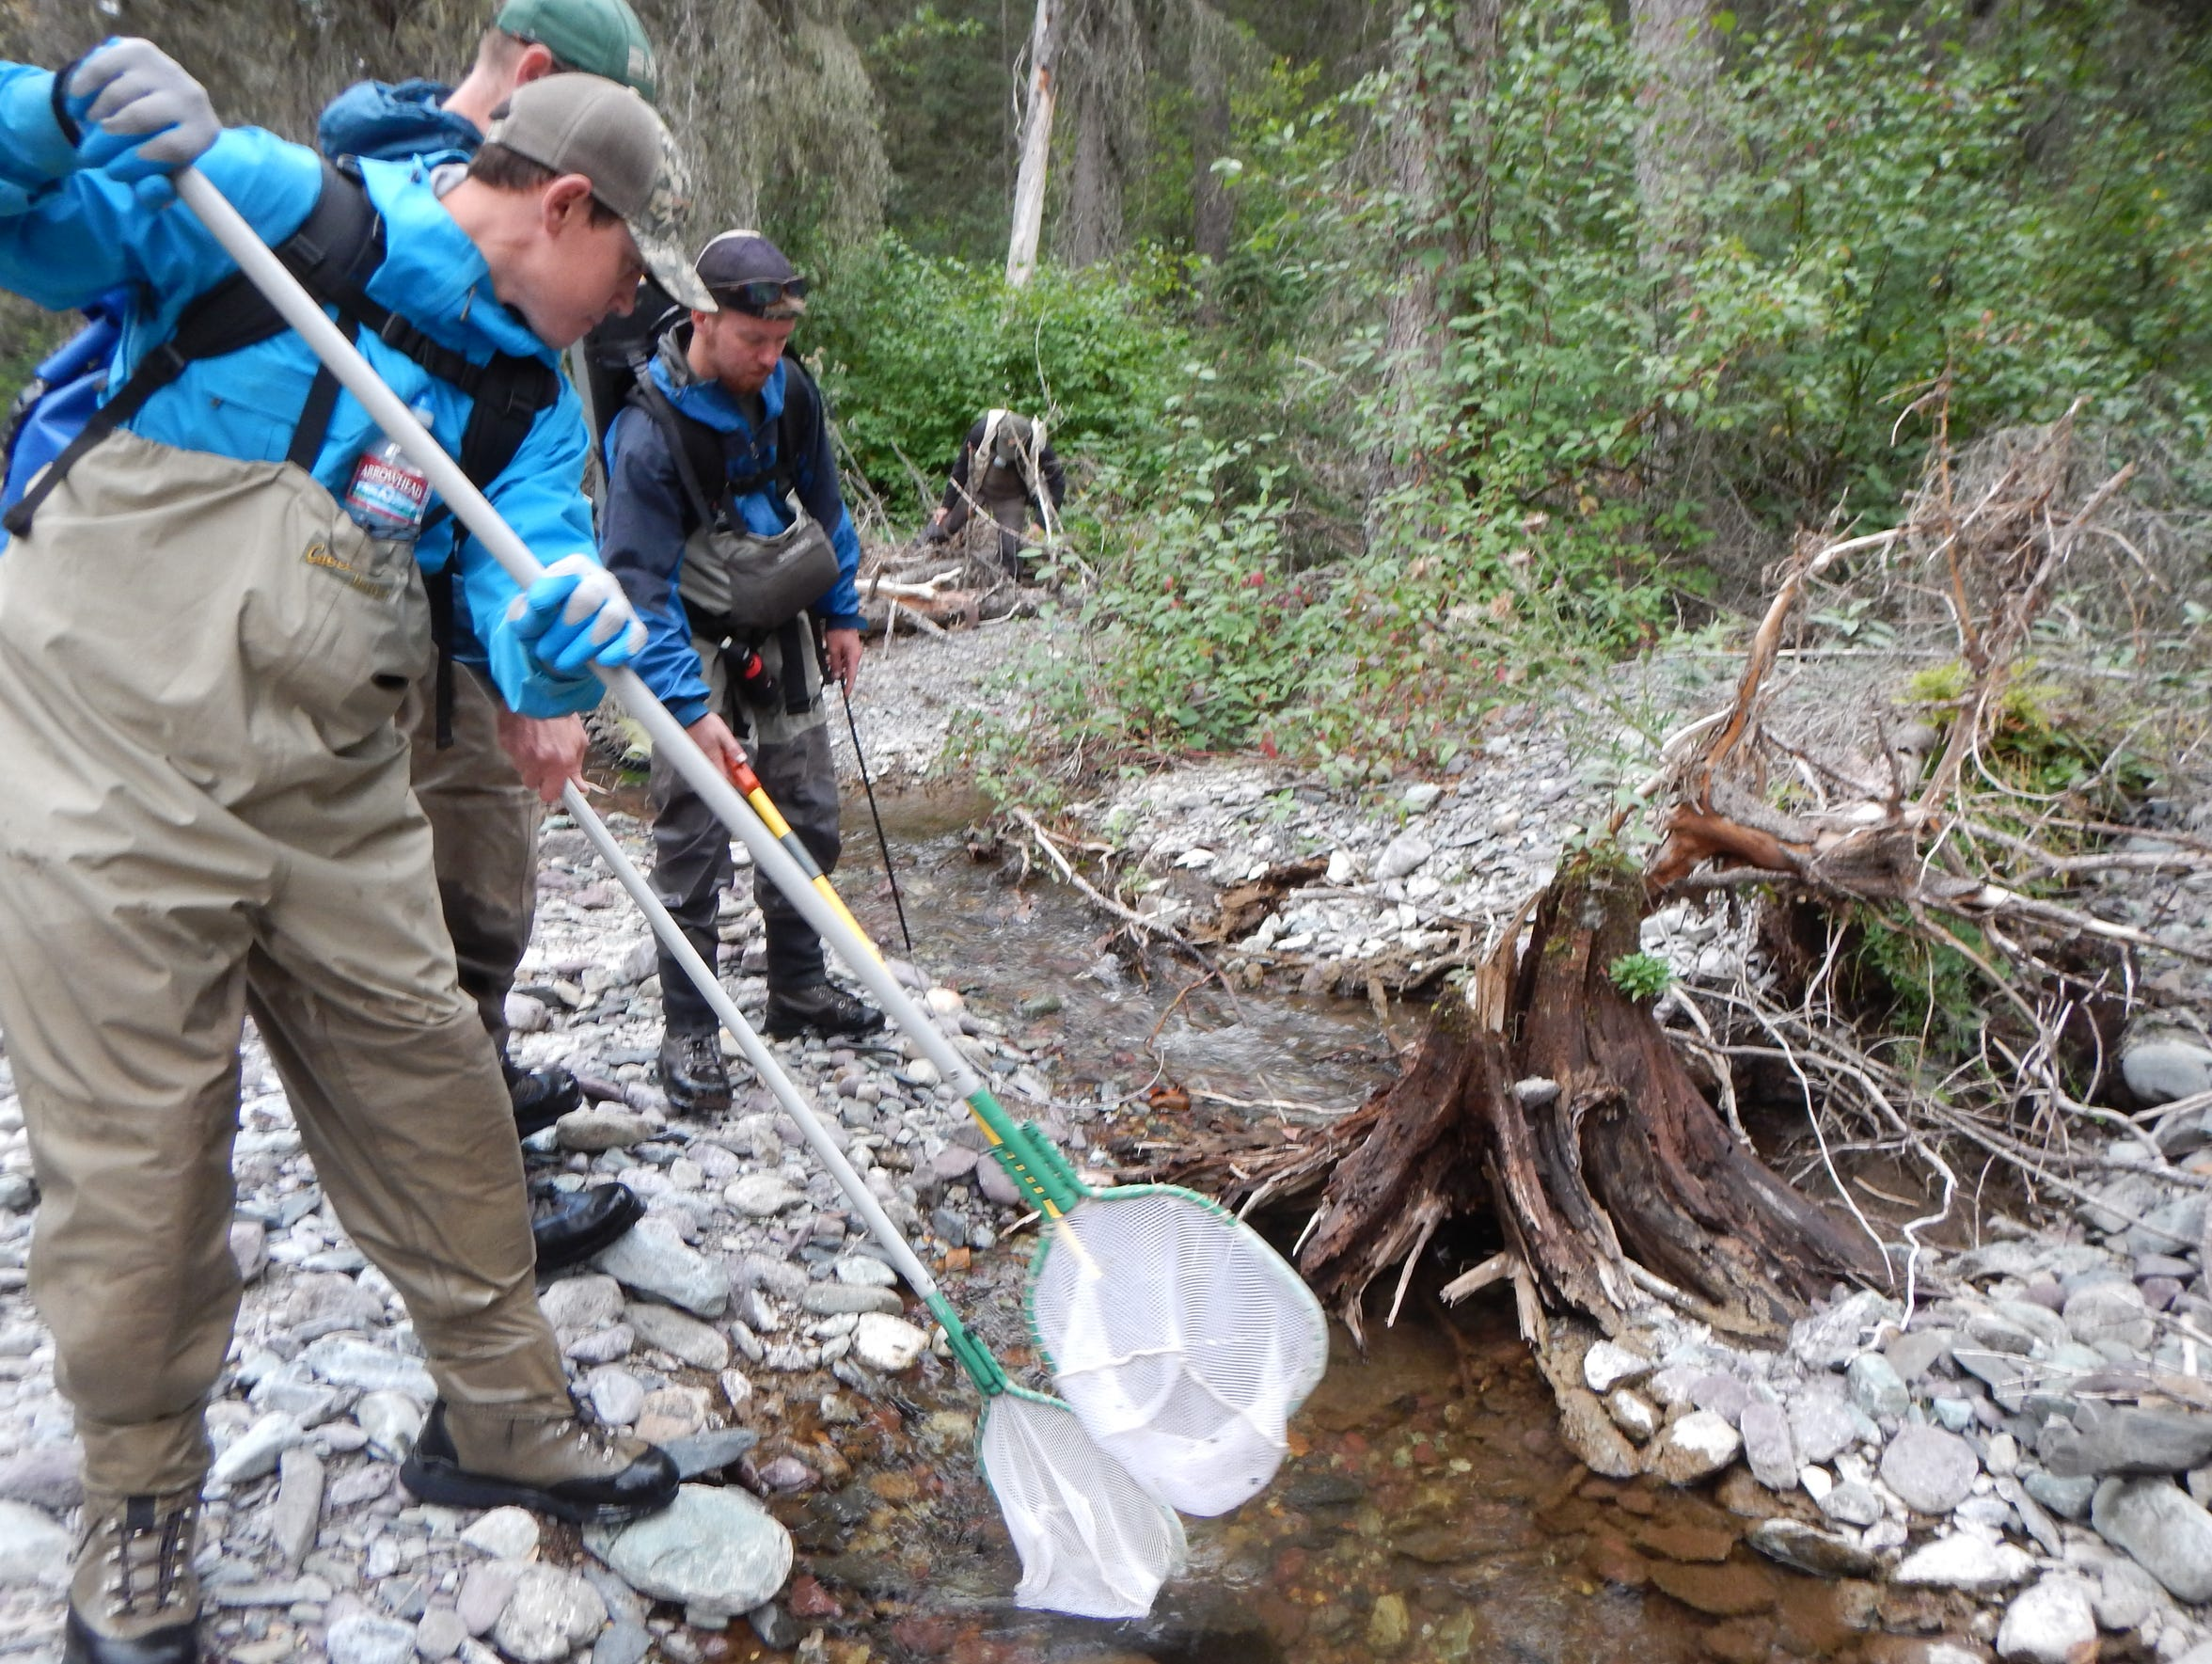 Front to back: Biologist Jon McCubbins, ecologist Clint